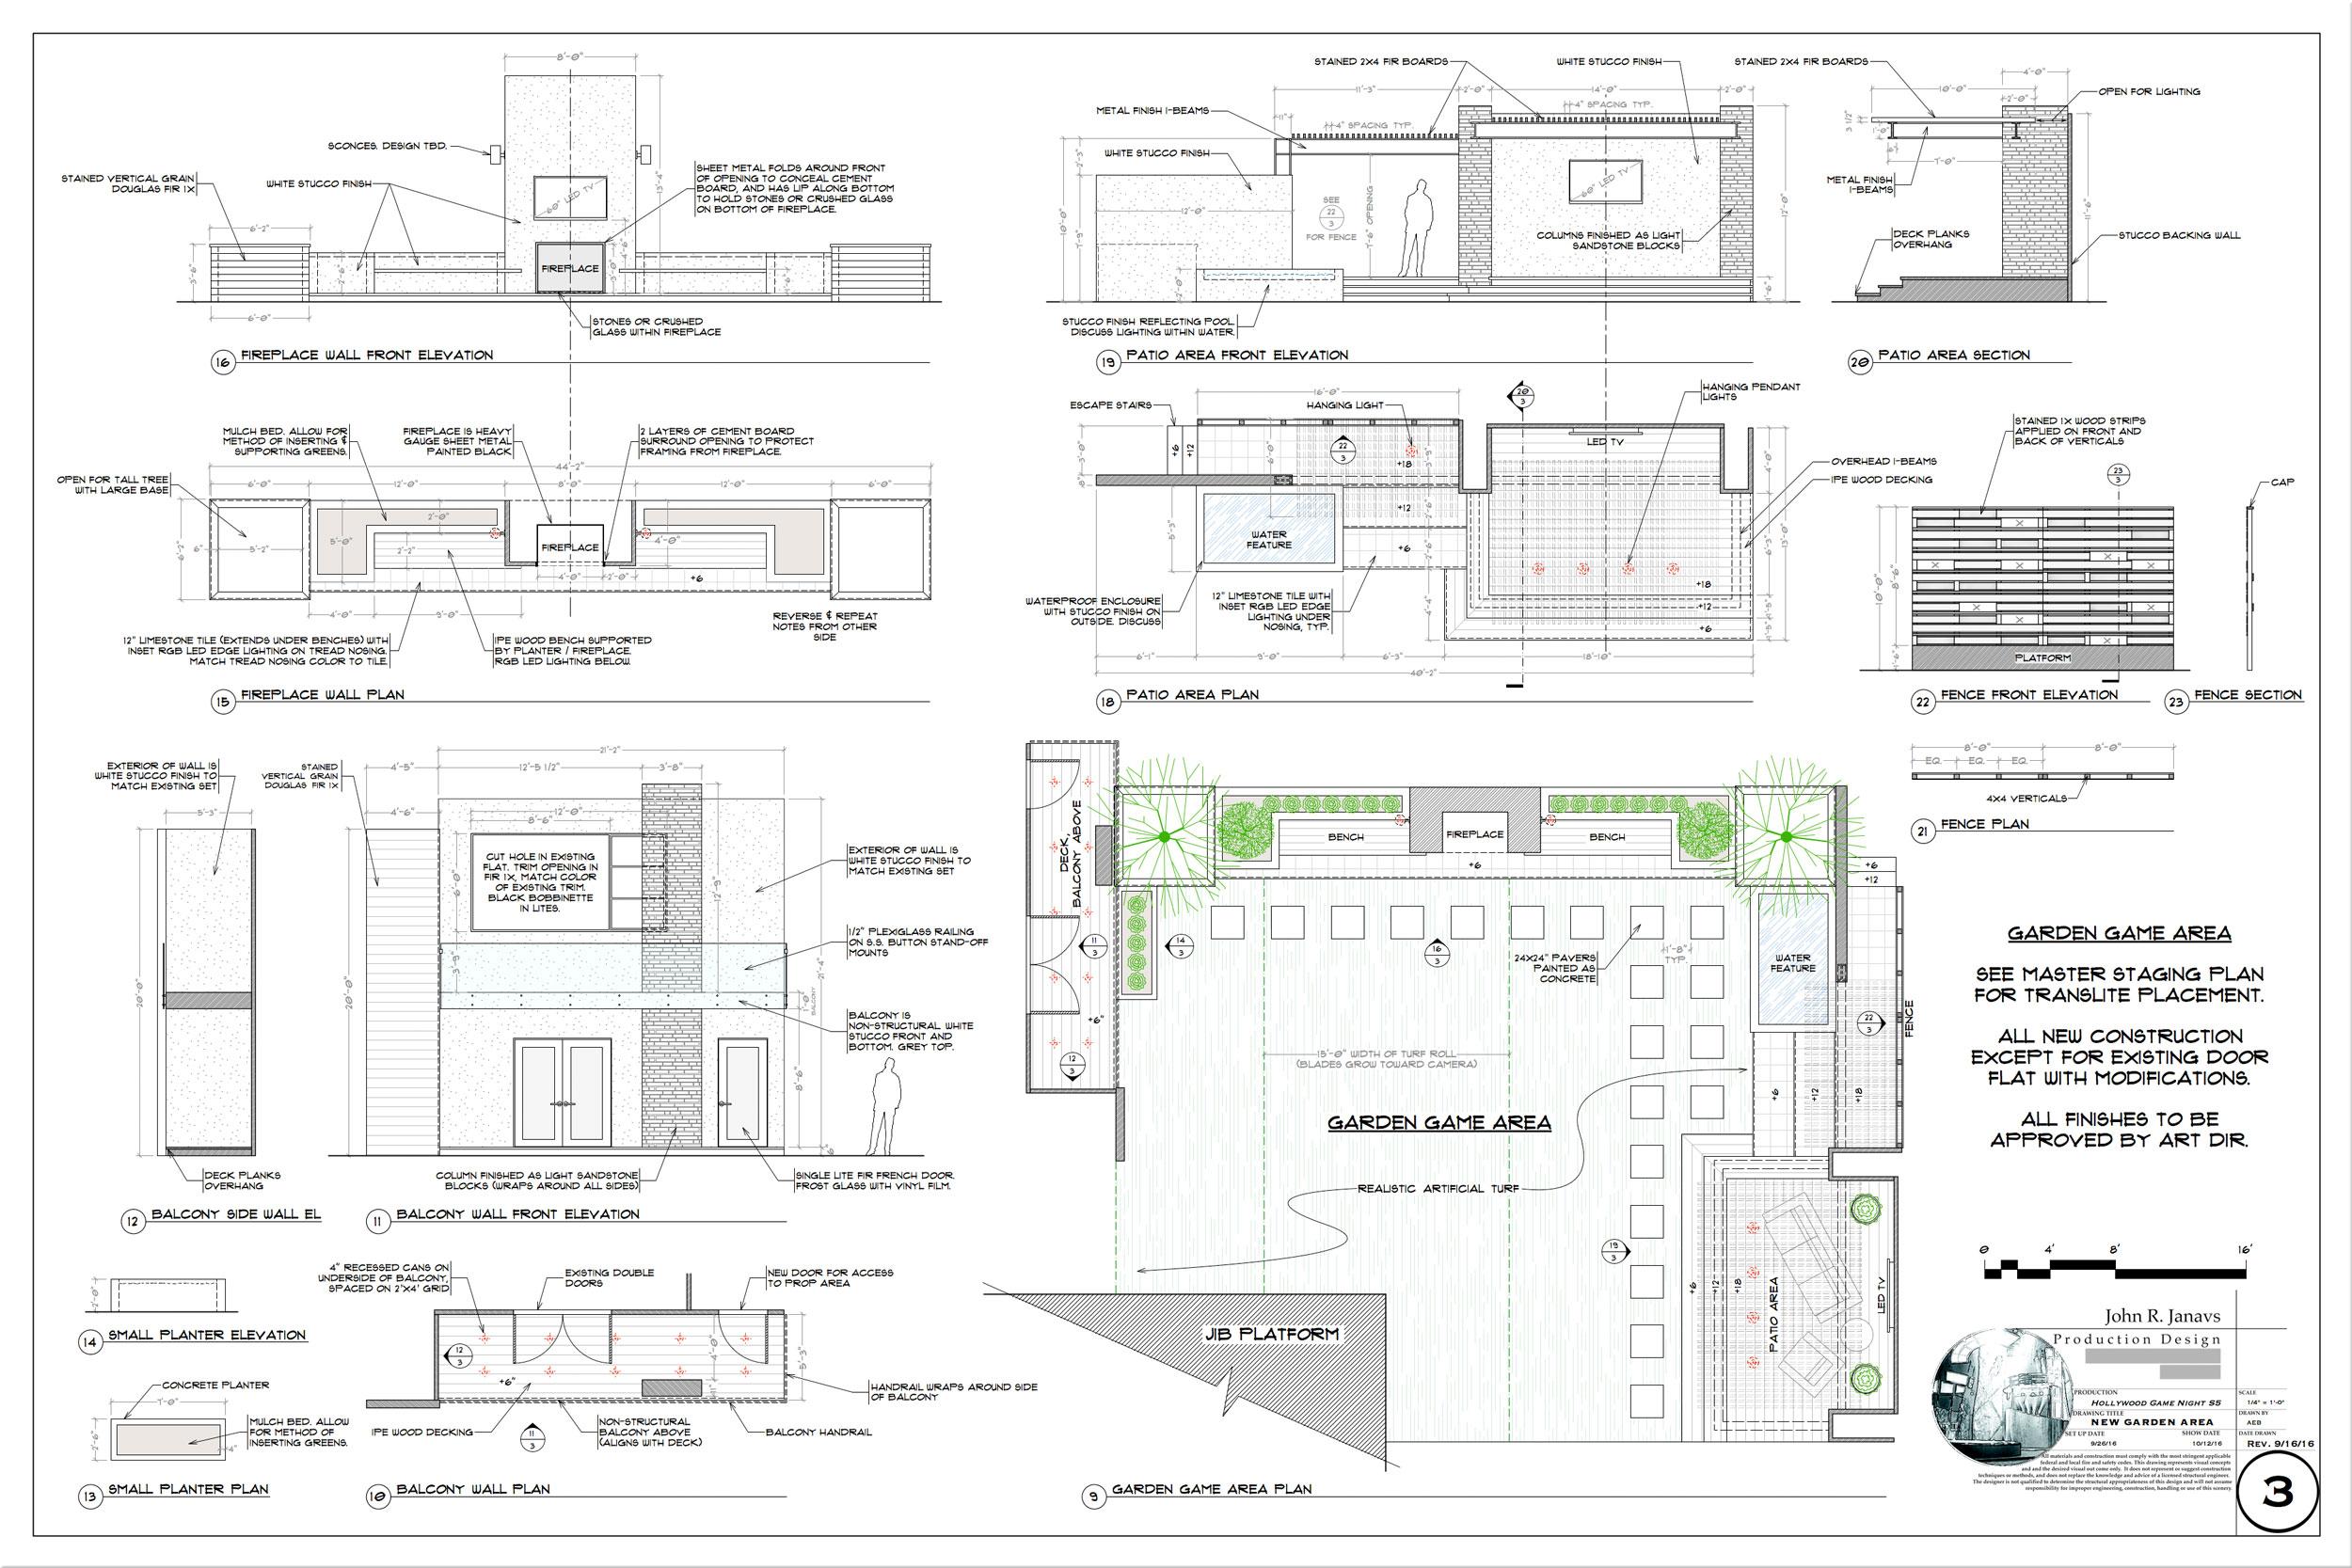 andy-broomell-set-design-drafting-hgn.jpg